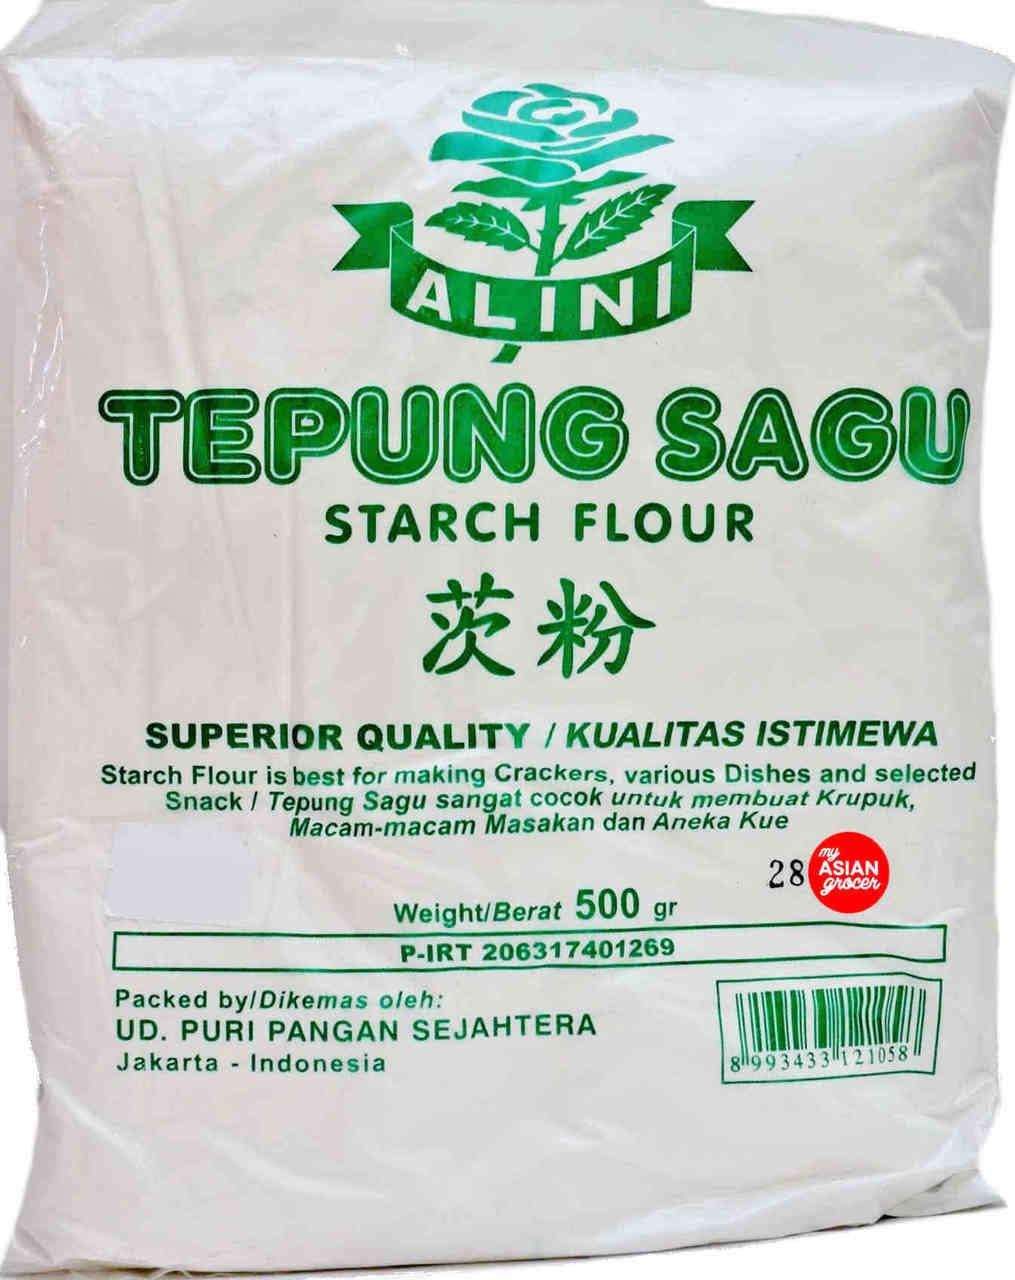 Alini Tepung Sagu Starch Flour 500g My Asian Grocer